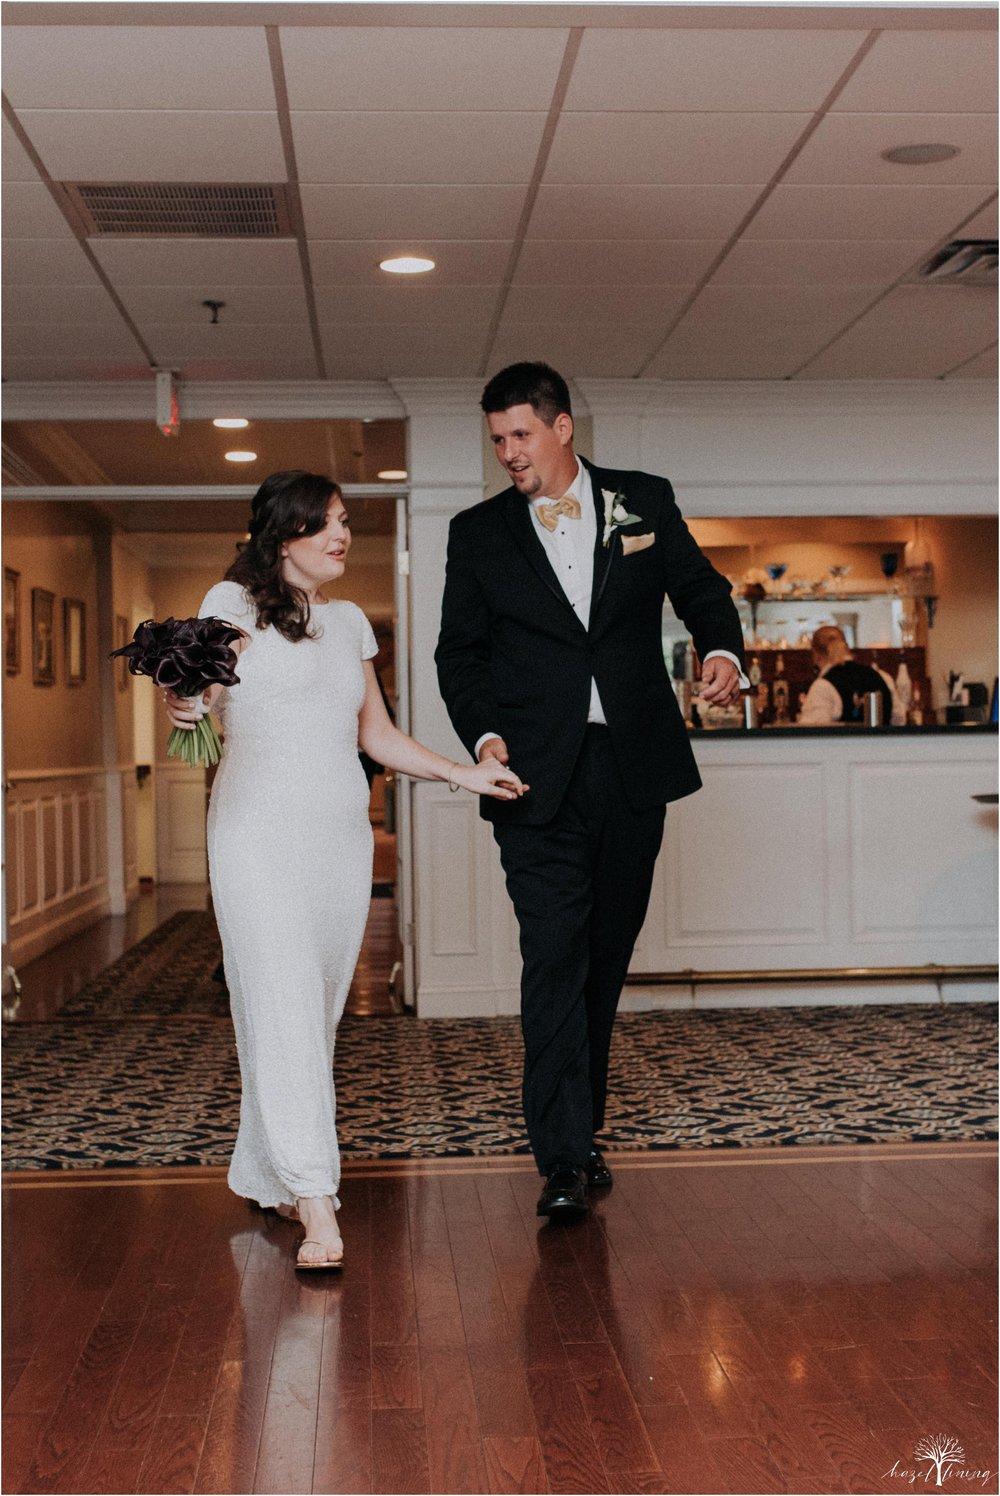 elizabeth-doelp-andrew-foreback-middletown-country-club-summer-langhorne-pennsylvania-wedding-hazel-lining-travel-wedding-elopement-photography_0126.jpg